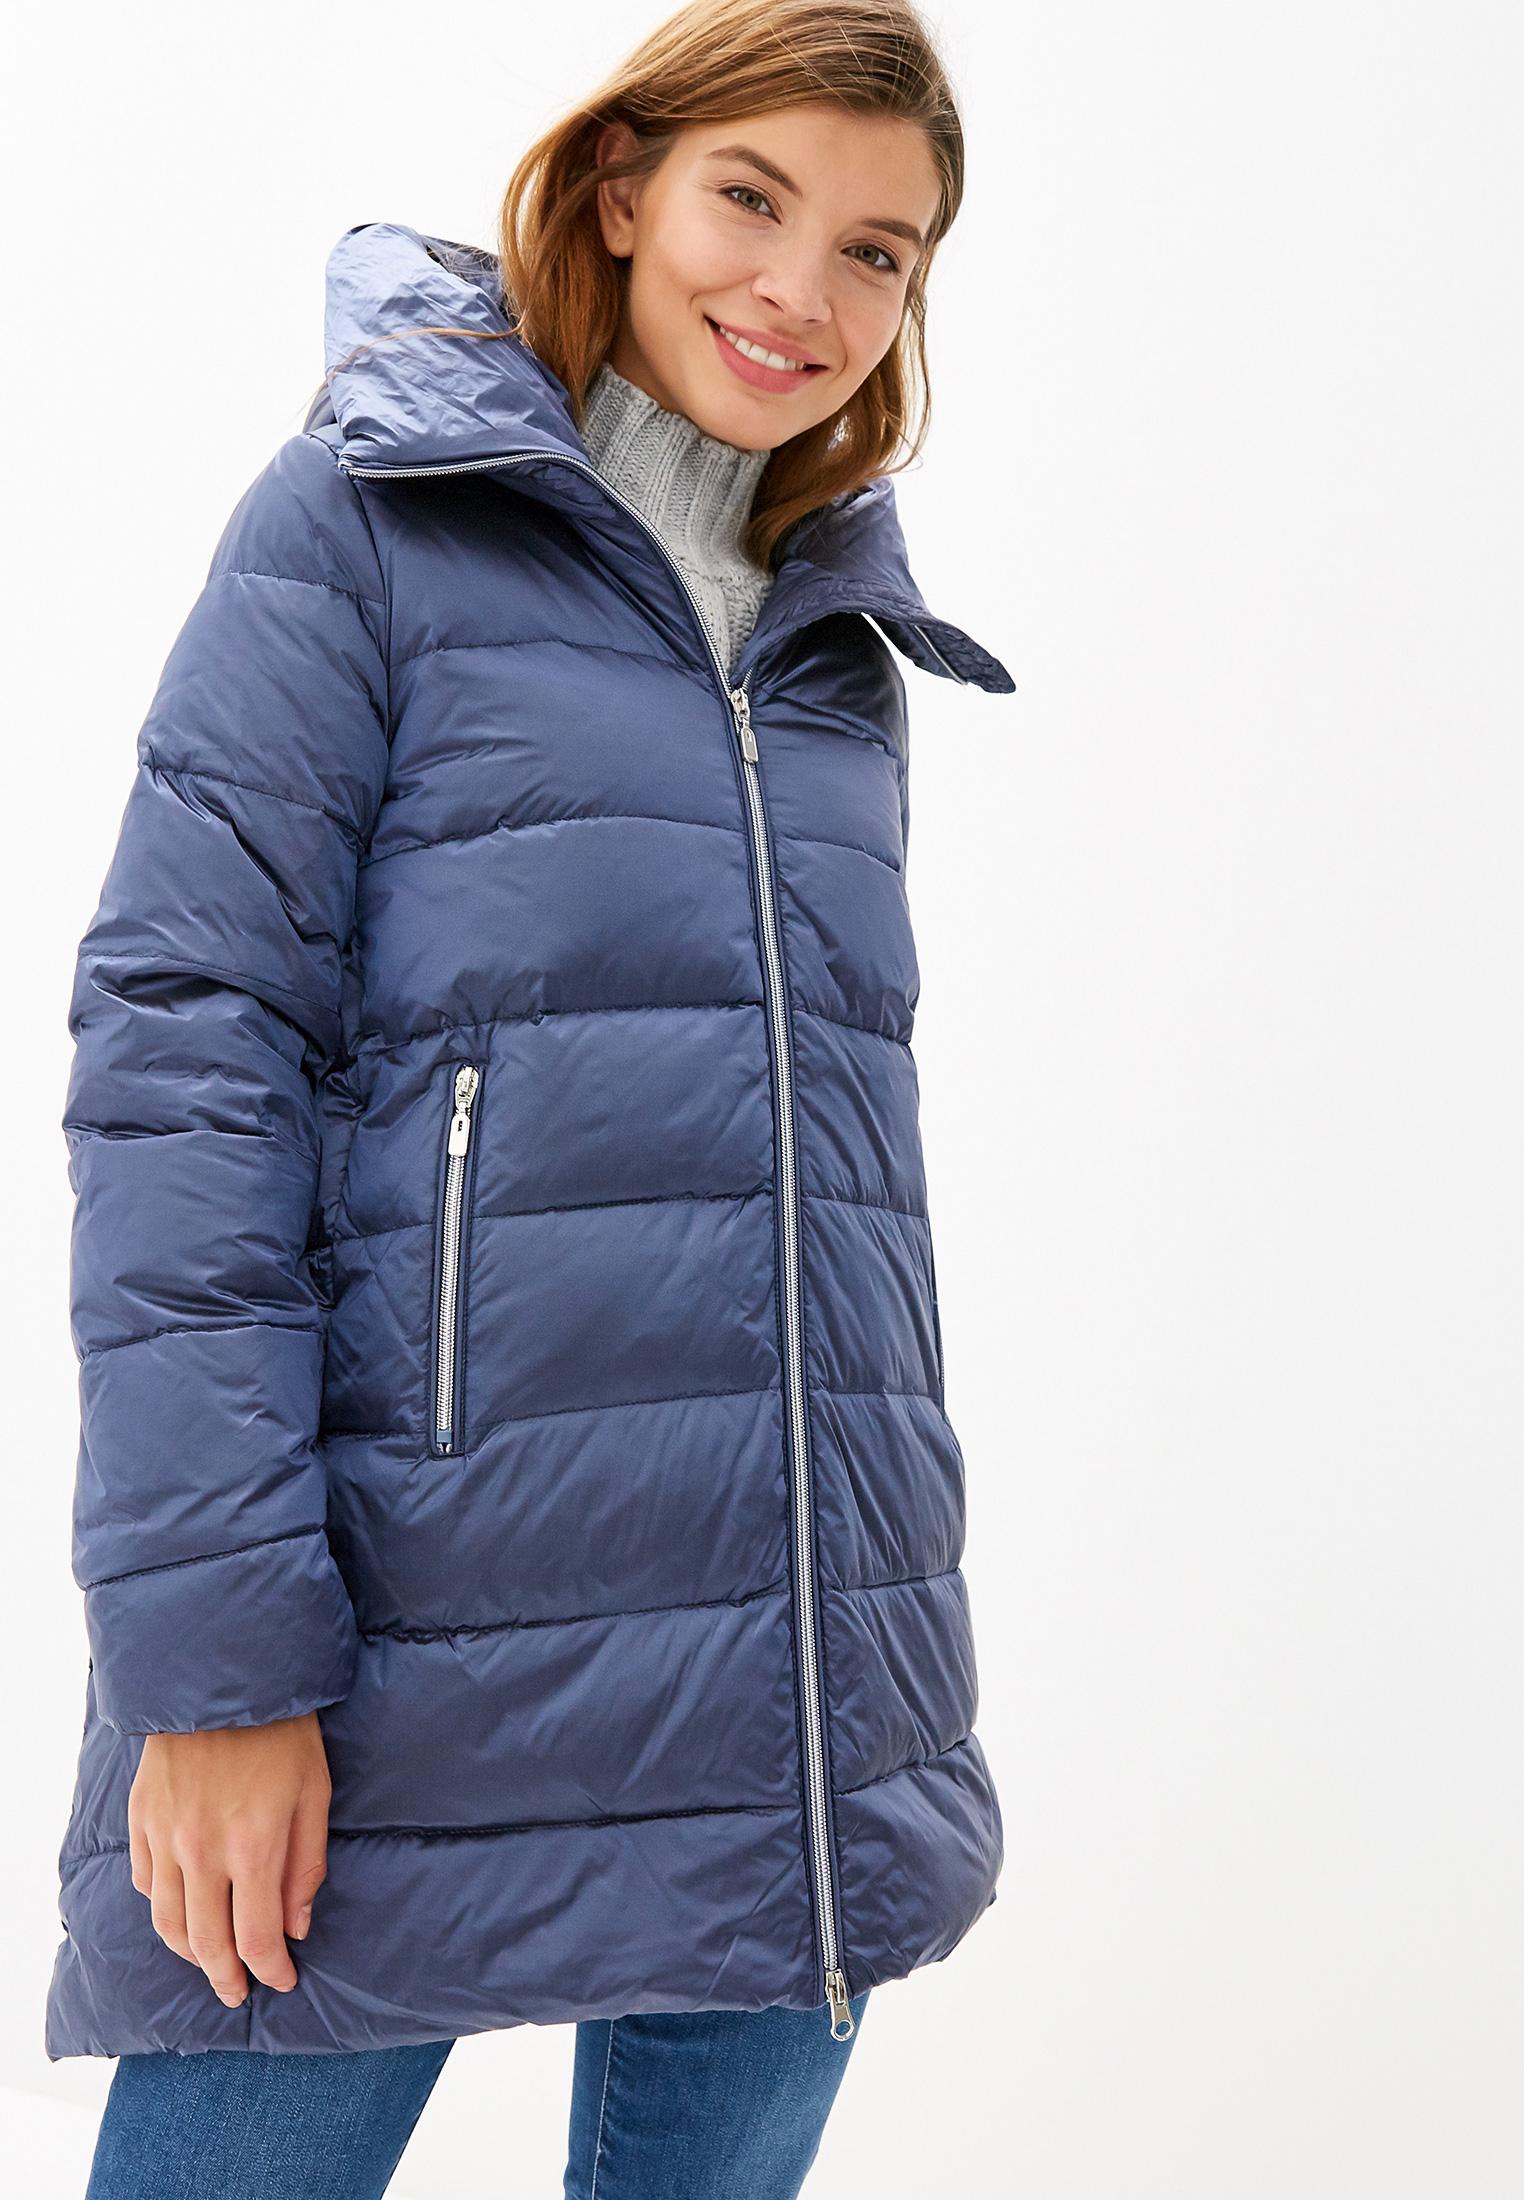 Пуховик, Savage, цвет: синий. Артикул: SA004EWGESA1. Одежда / Верхняя одежда / Пуховики и зимние куртки